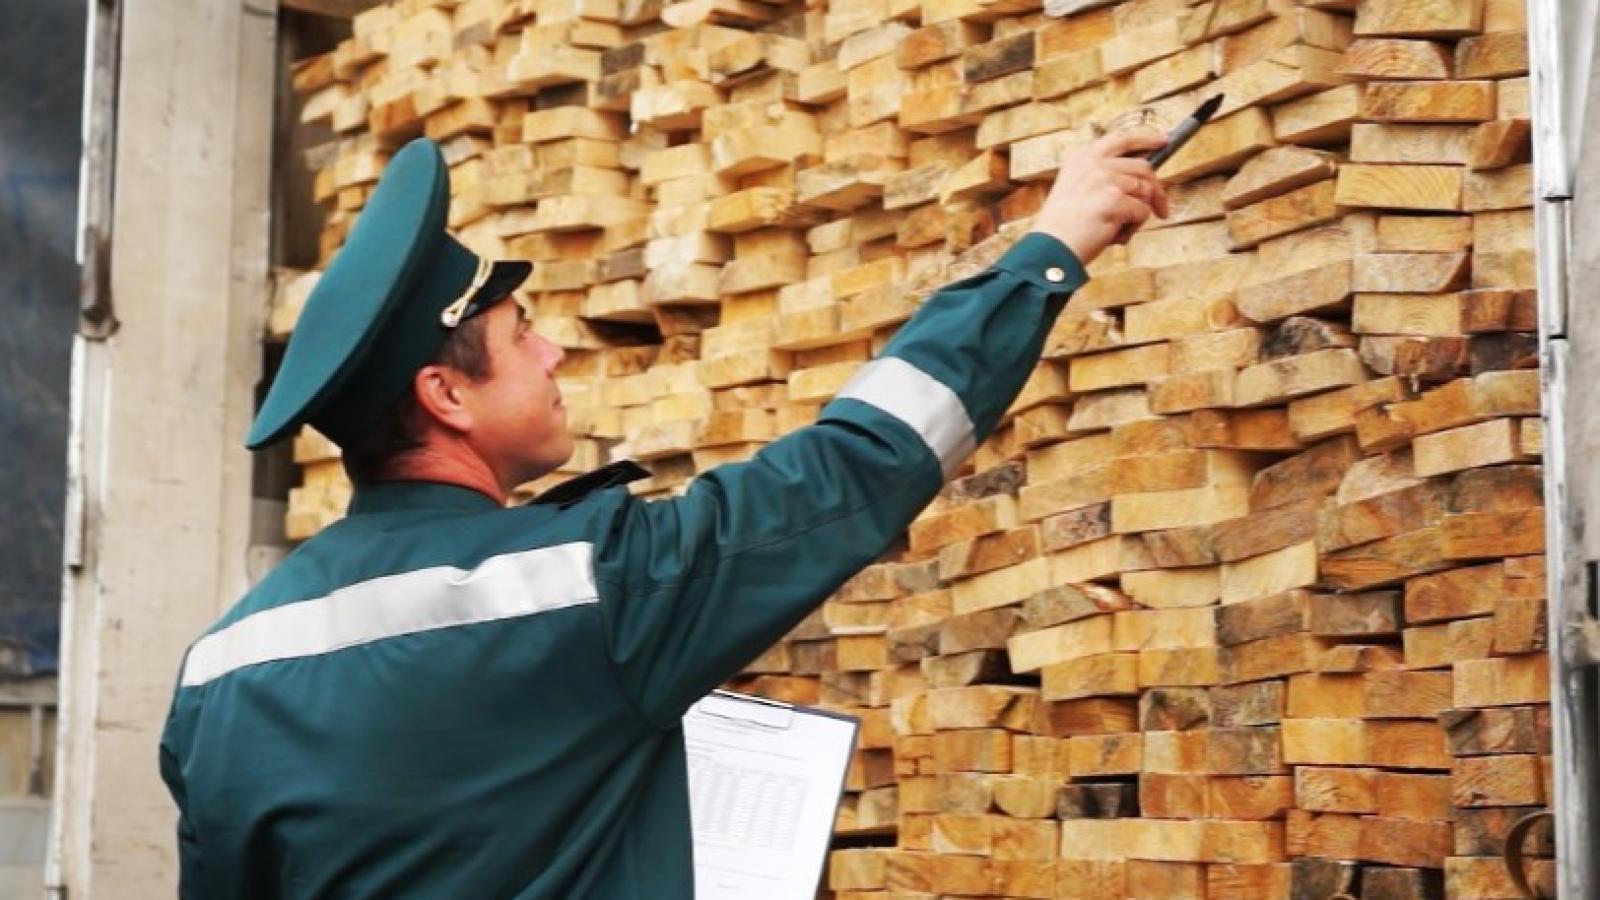 Через вологодскую таможню незаконно везли лес